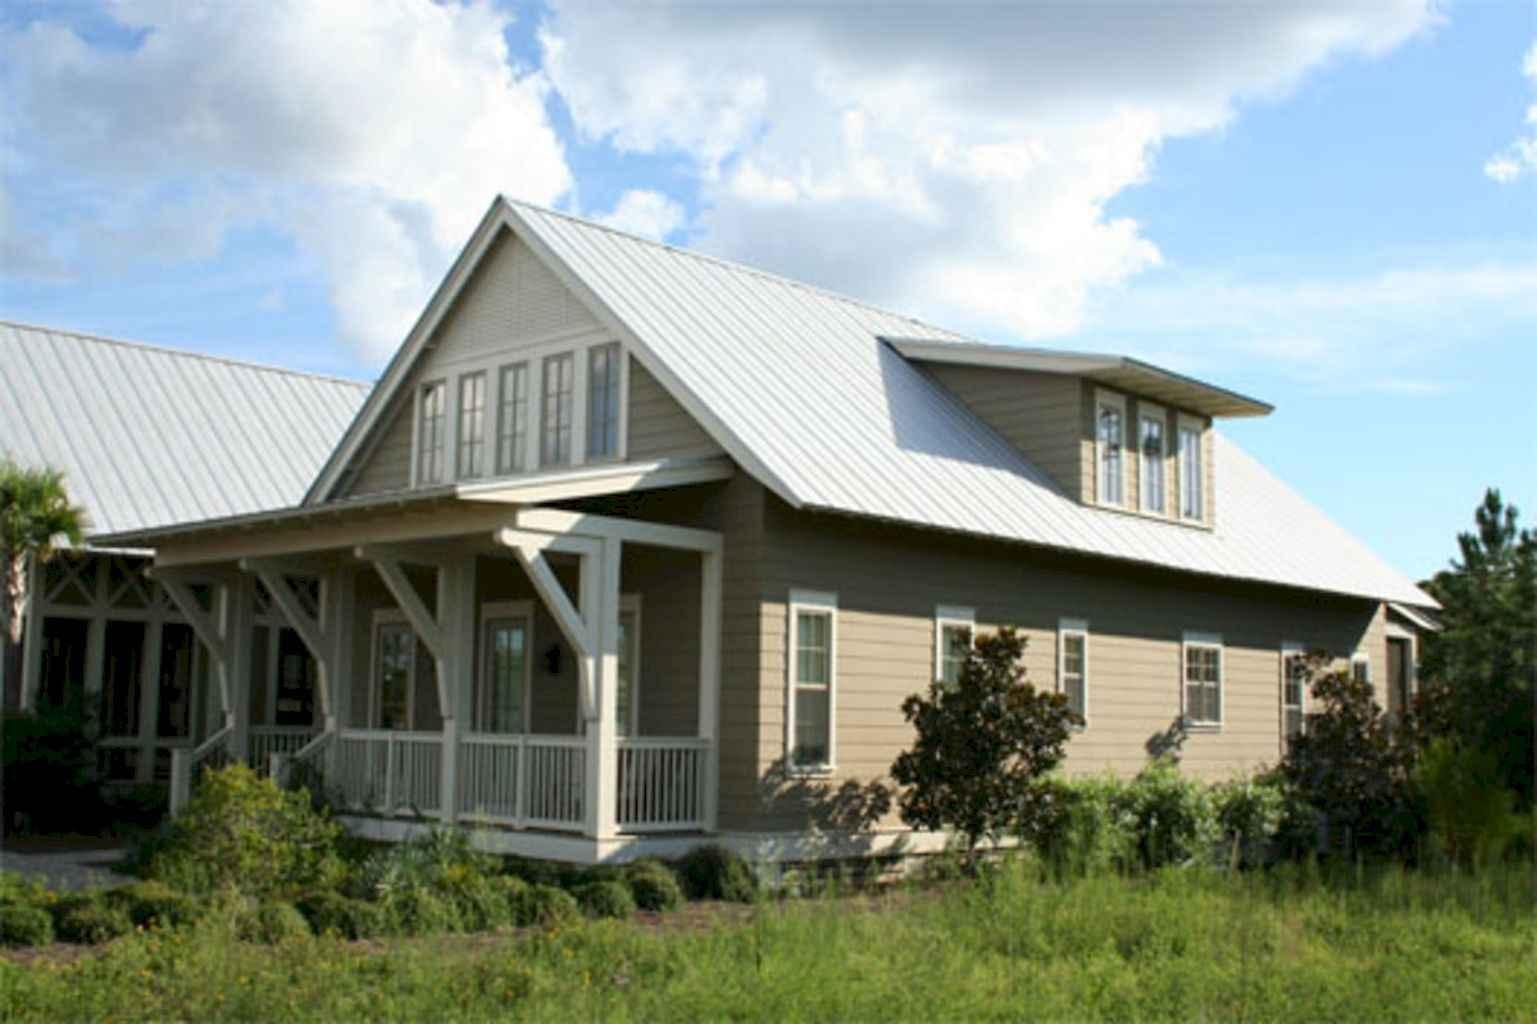 60 amazing farmhouse plans cracker style design ideas (48)